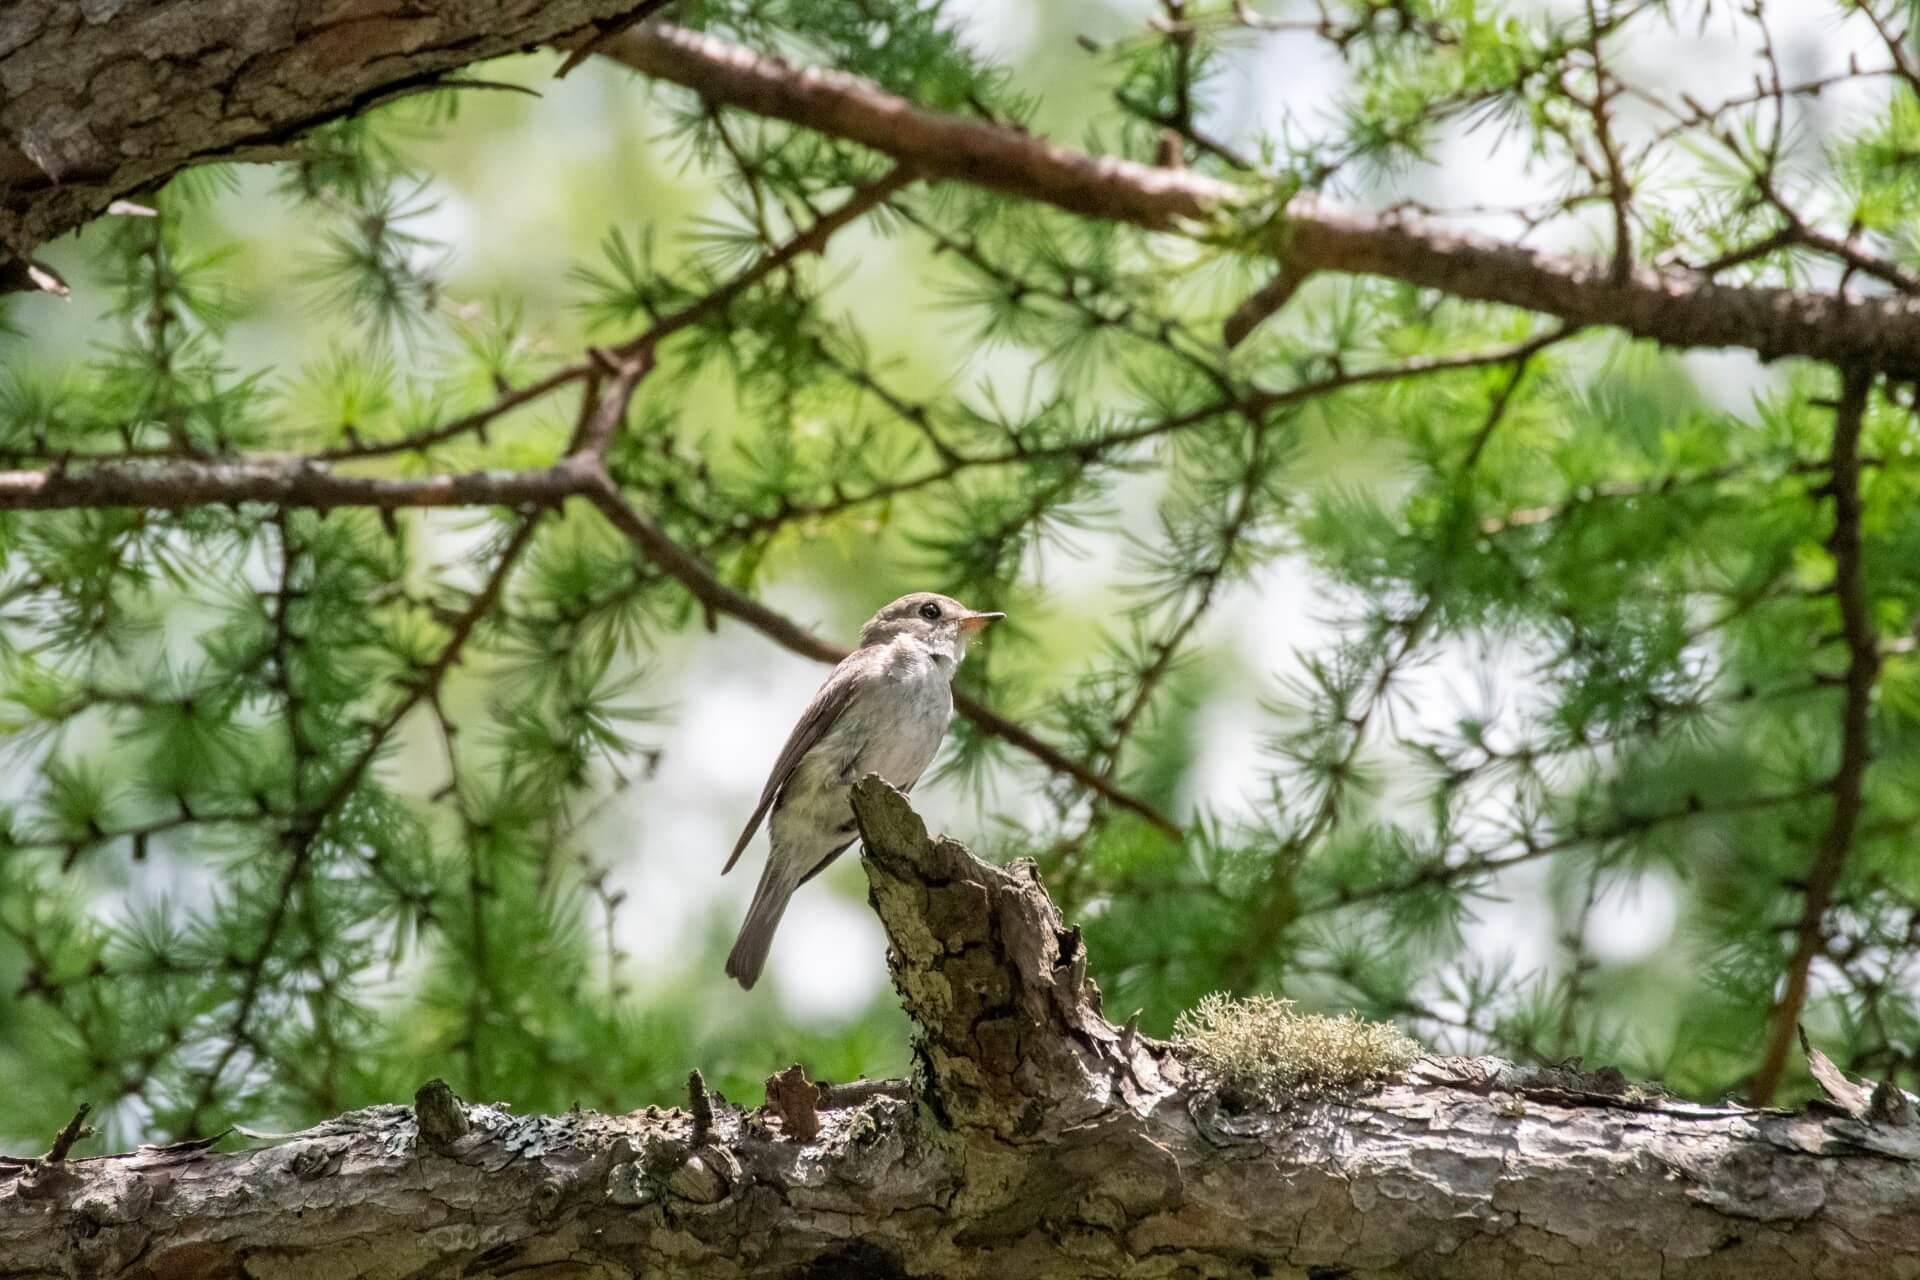 bird-chubu-sangaku-wildlife